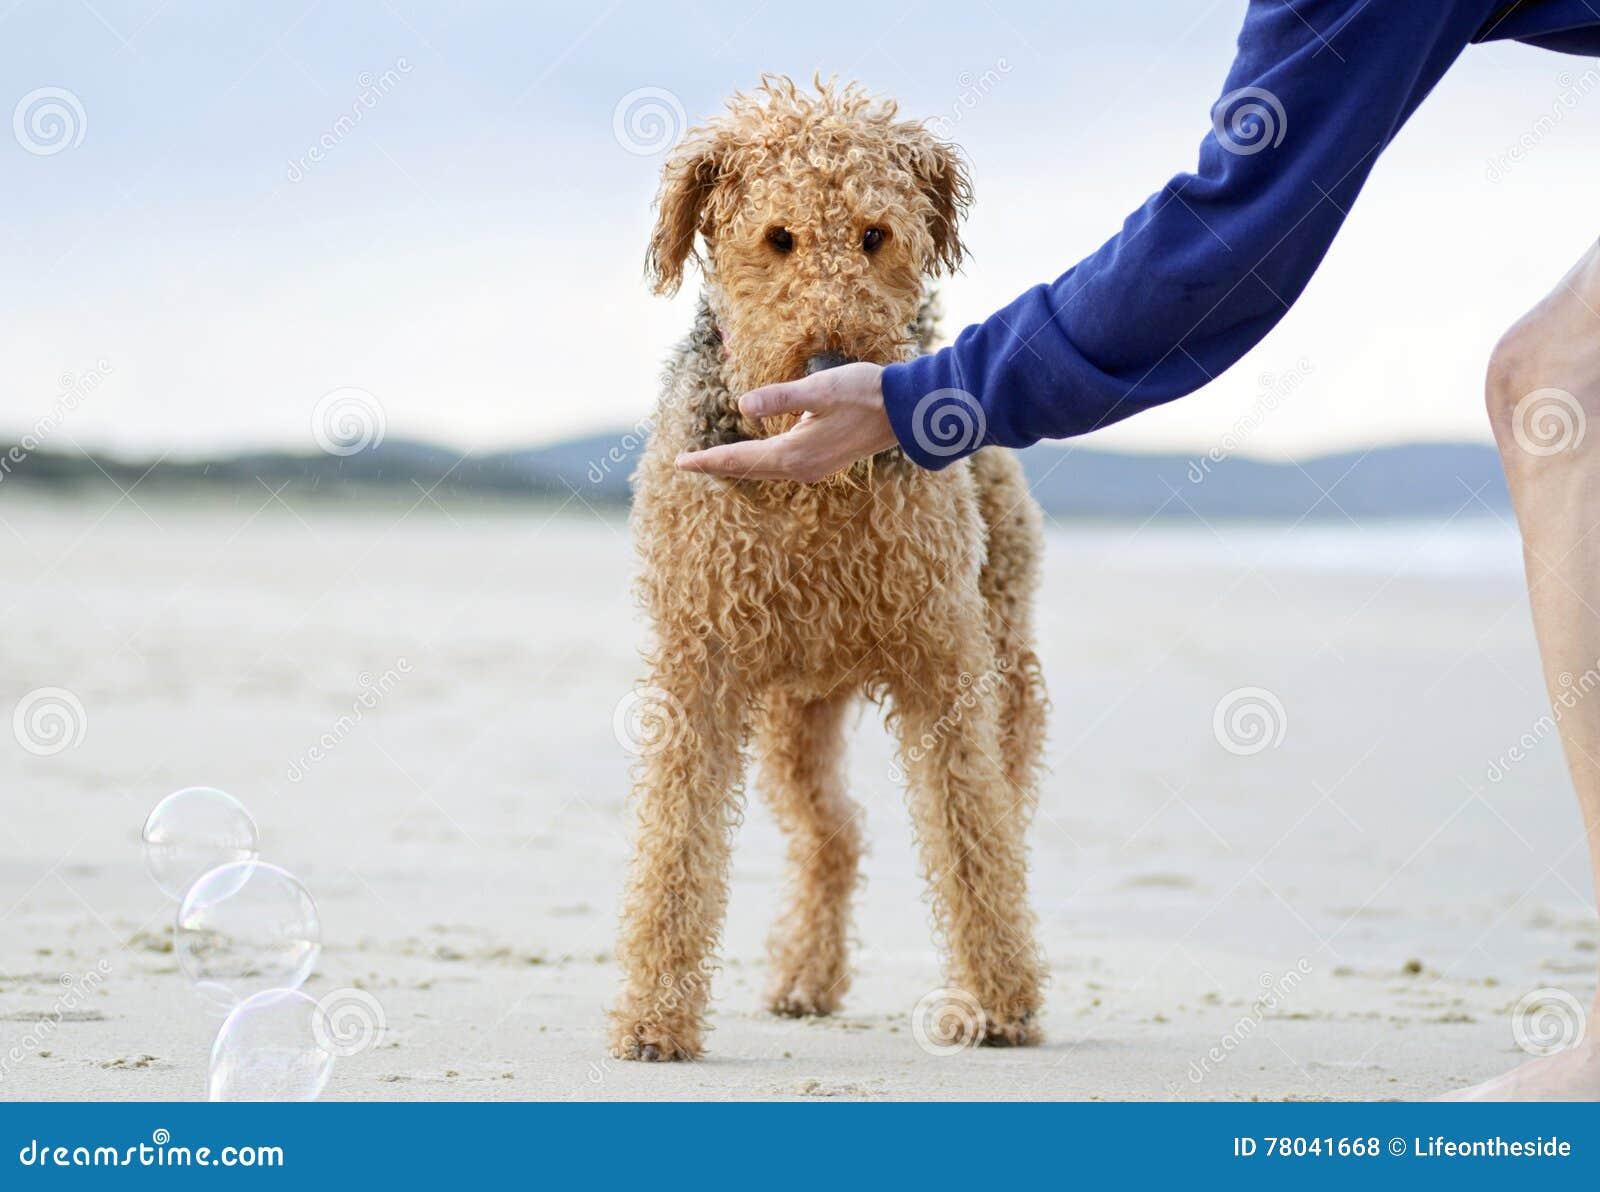 Cute Family Member On The Beach RoyaltyFree Illustration  CartoonDealer.com 84775722